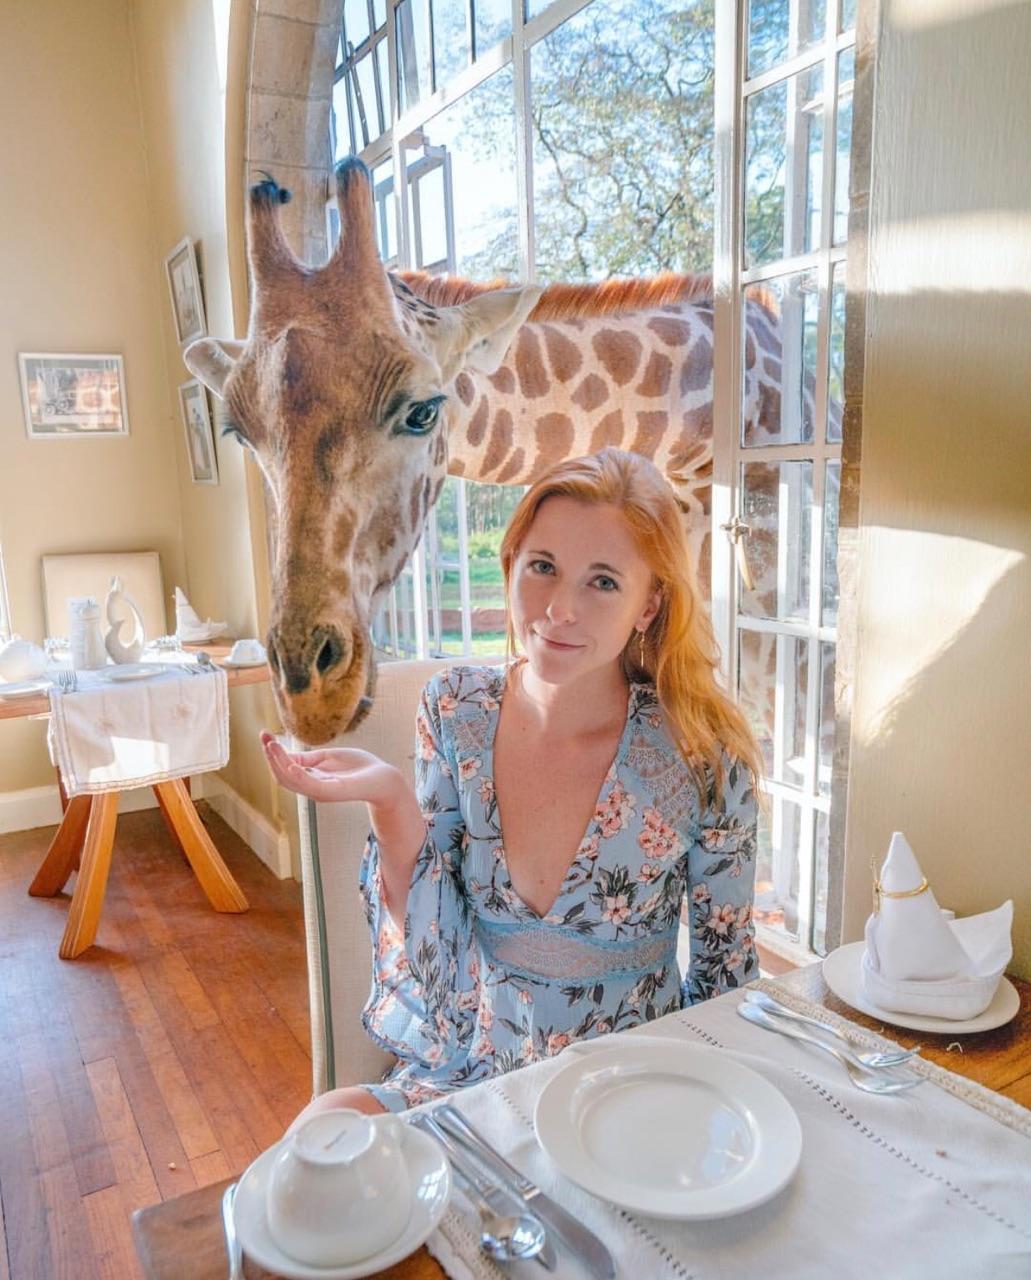 giraffe manorr kenya